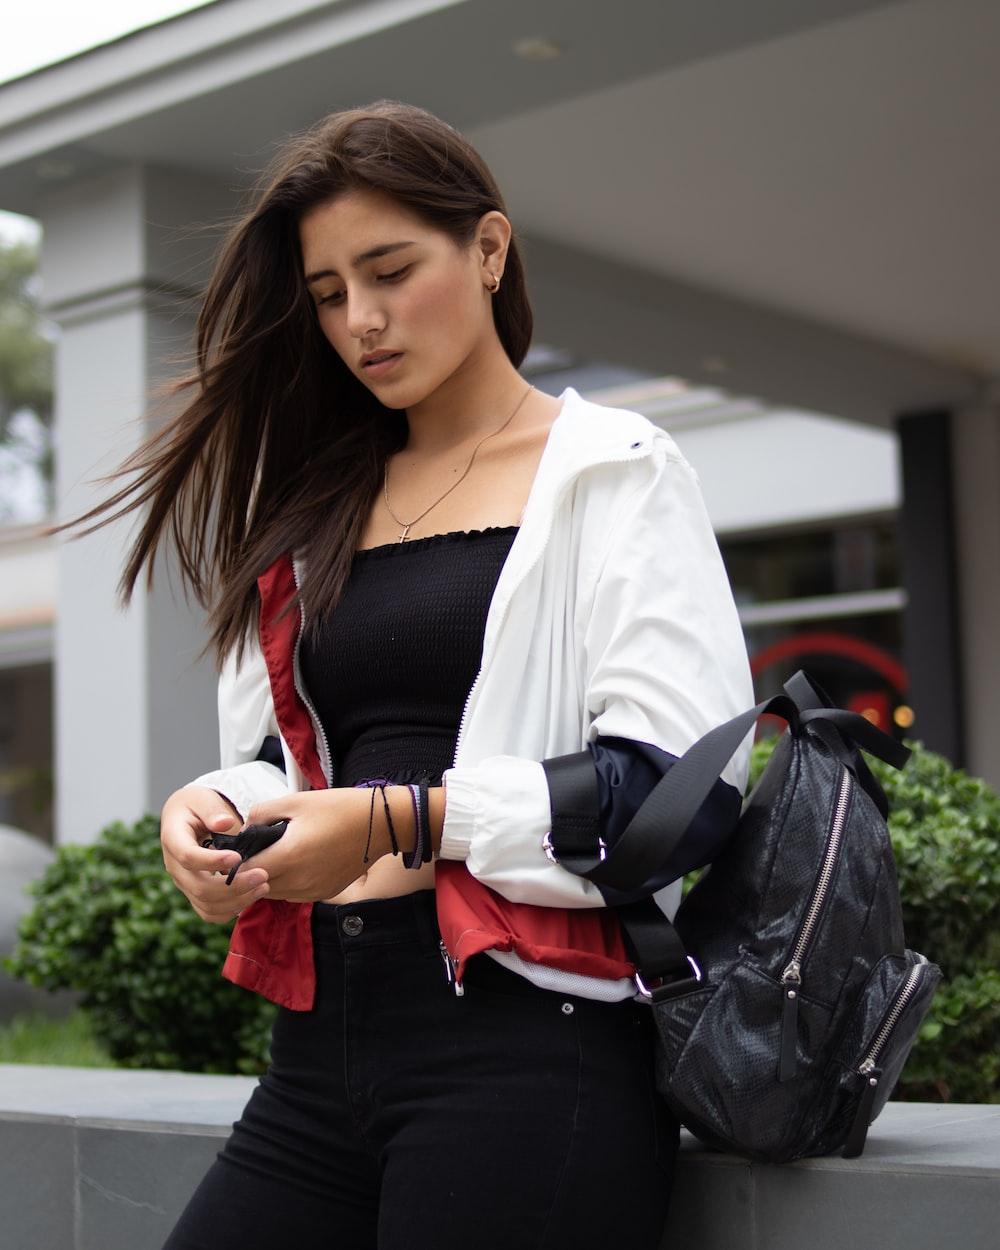 woman in white blazer and black dress shirt holding black leather shoulder bag